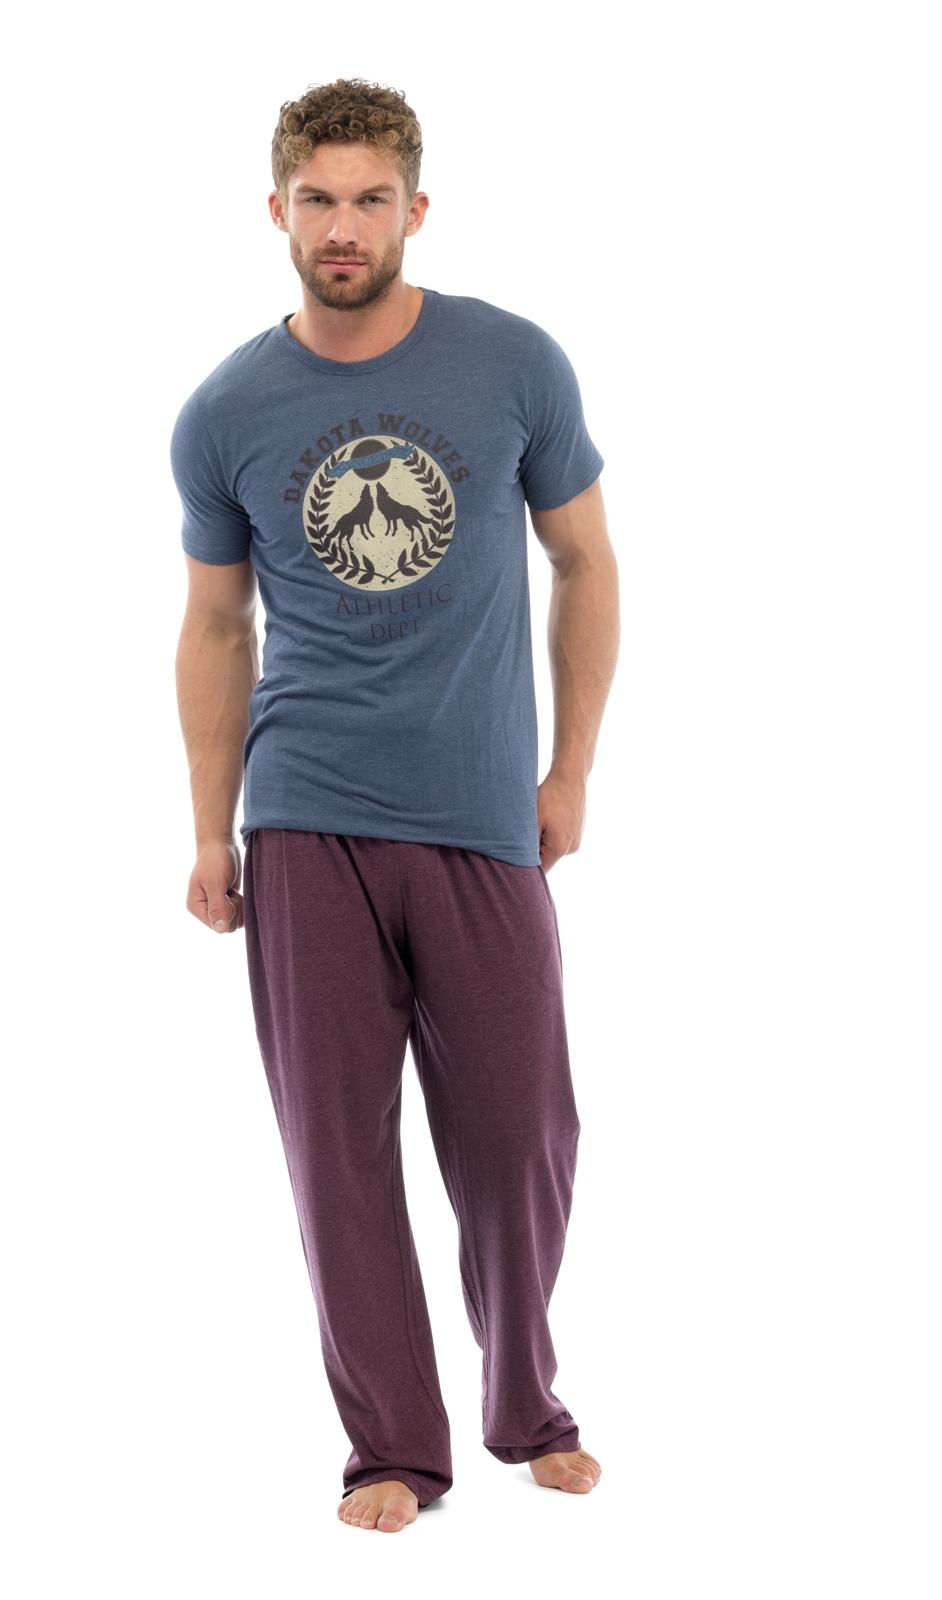 luxury mens long pyjamas 2 piece lounge set gents nightwear boys pjs size m xxl ebay. Black Bedroom Furniture Sets. Home Design Ideas